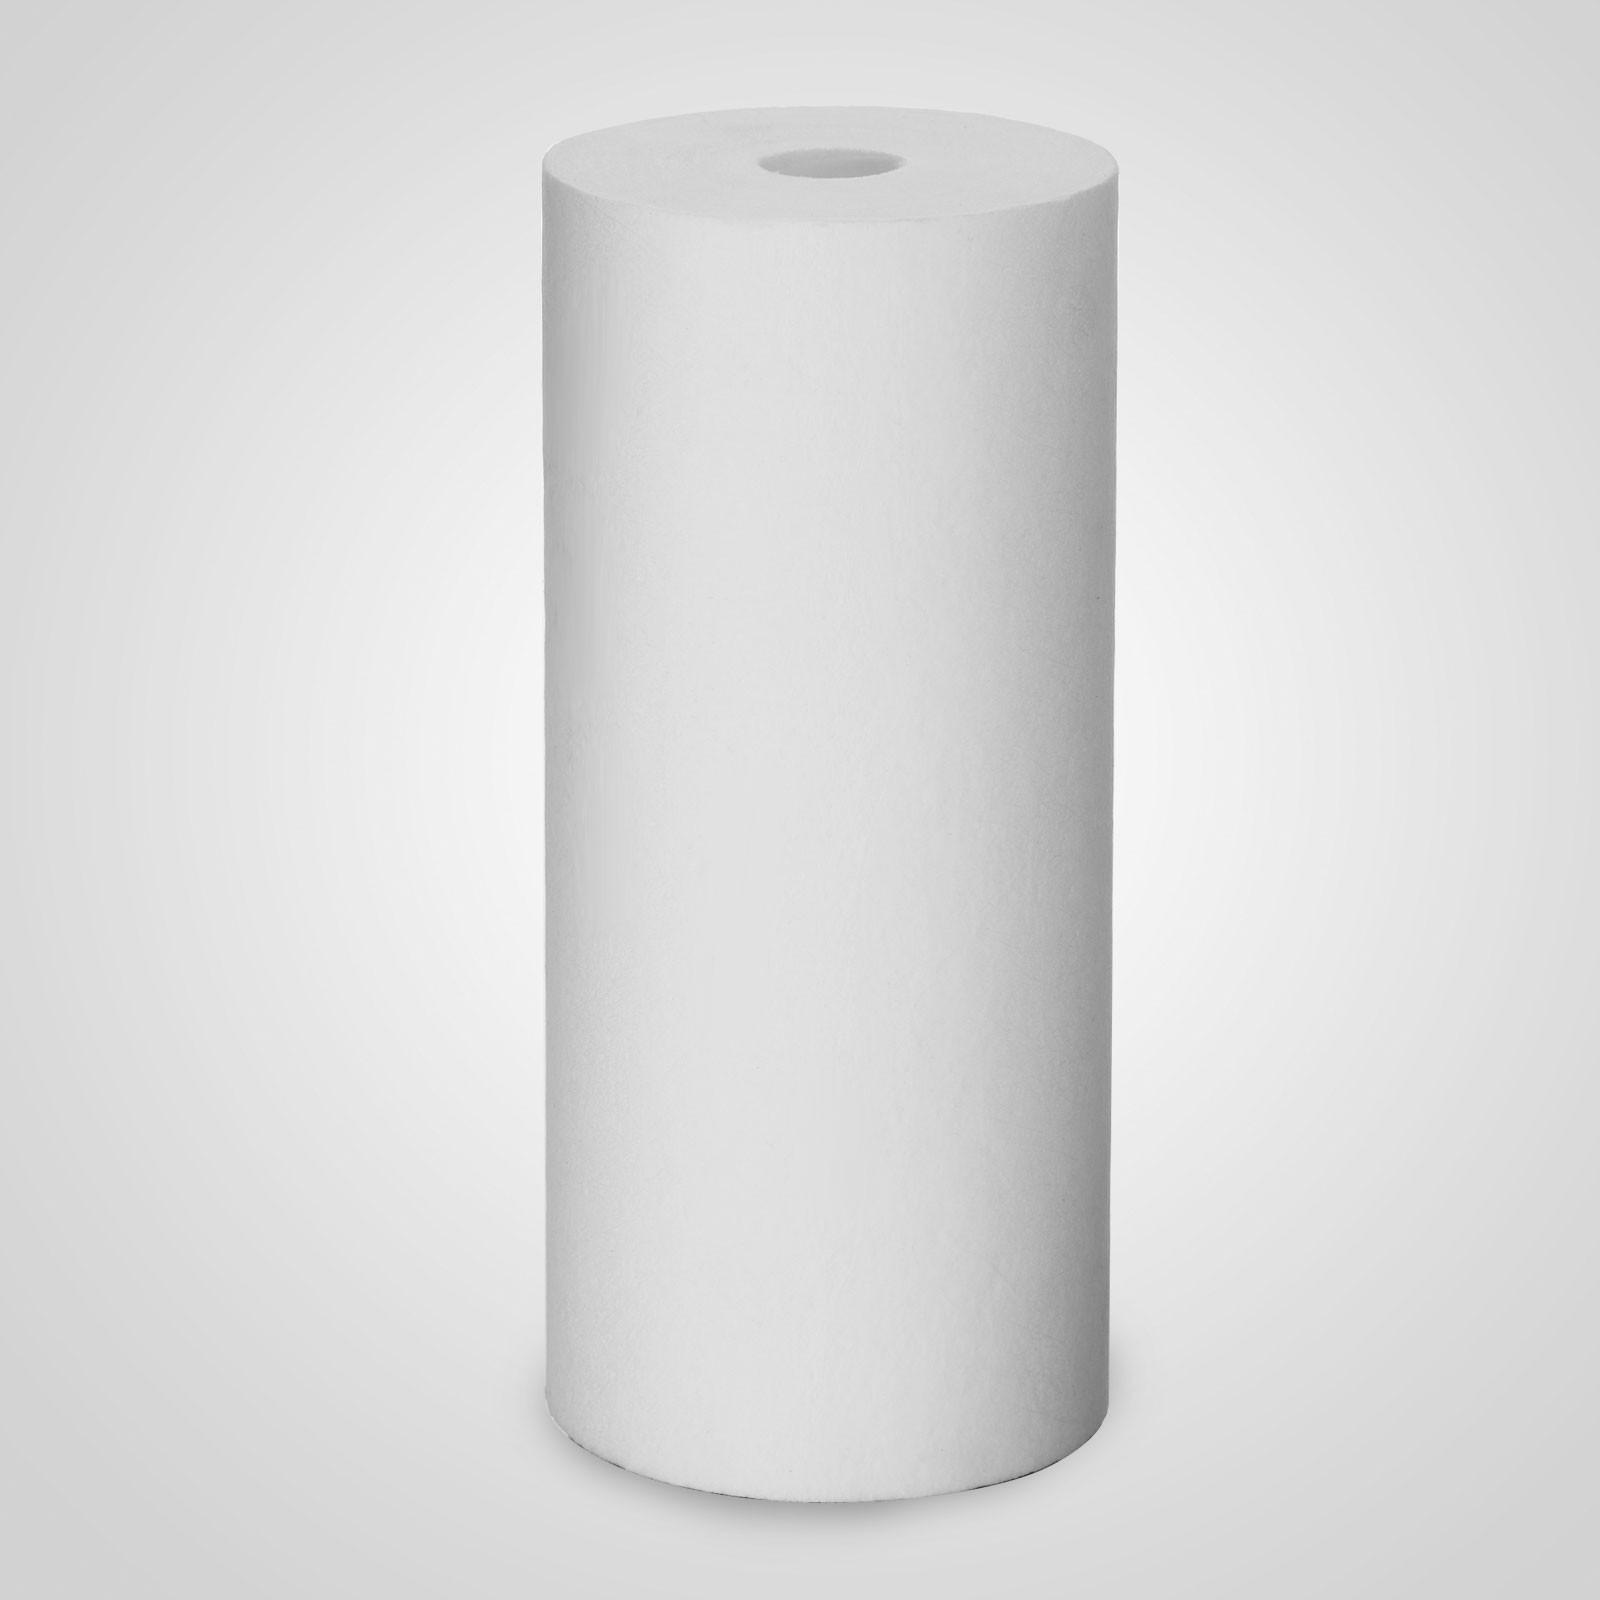 20Pcs-Cartouche-Filtrante-5-Micron-10-034-X-4-5-034-as-Brita-Emballe-Individu-Bobine miniature 6